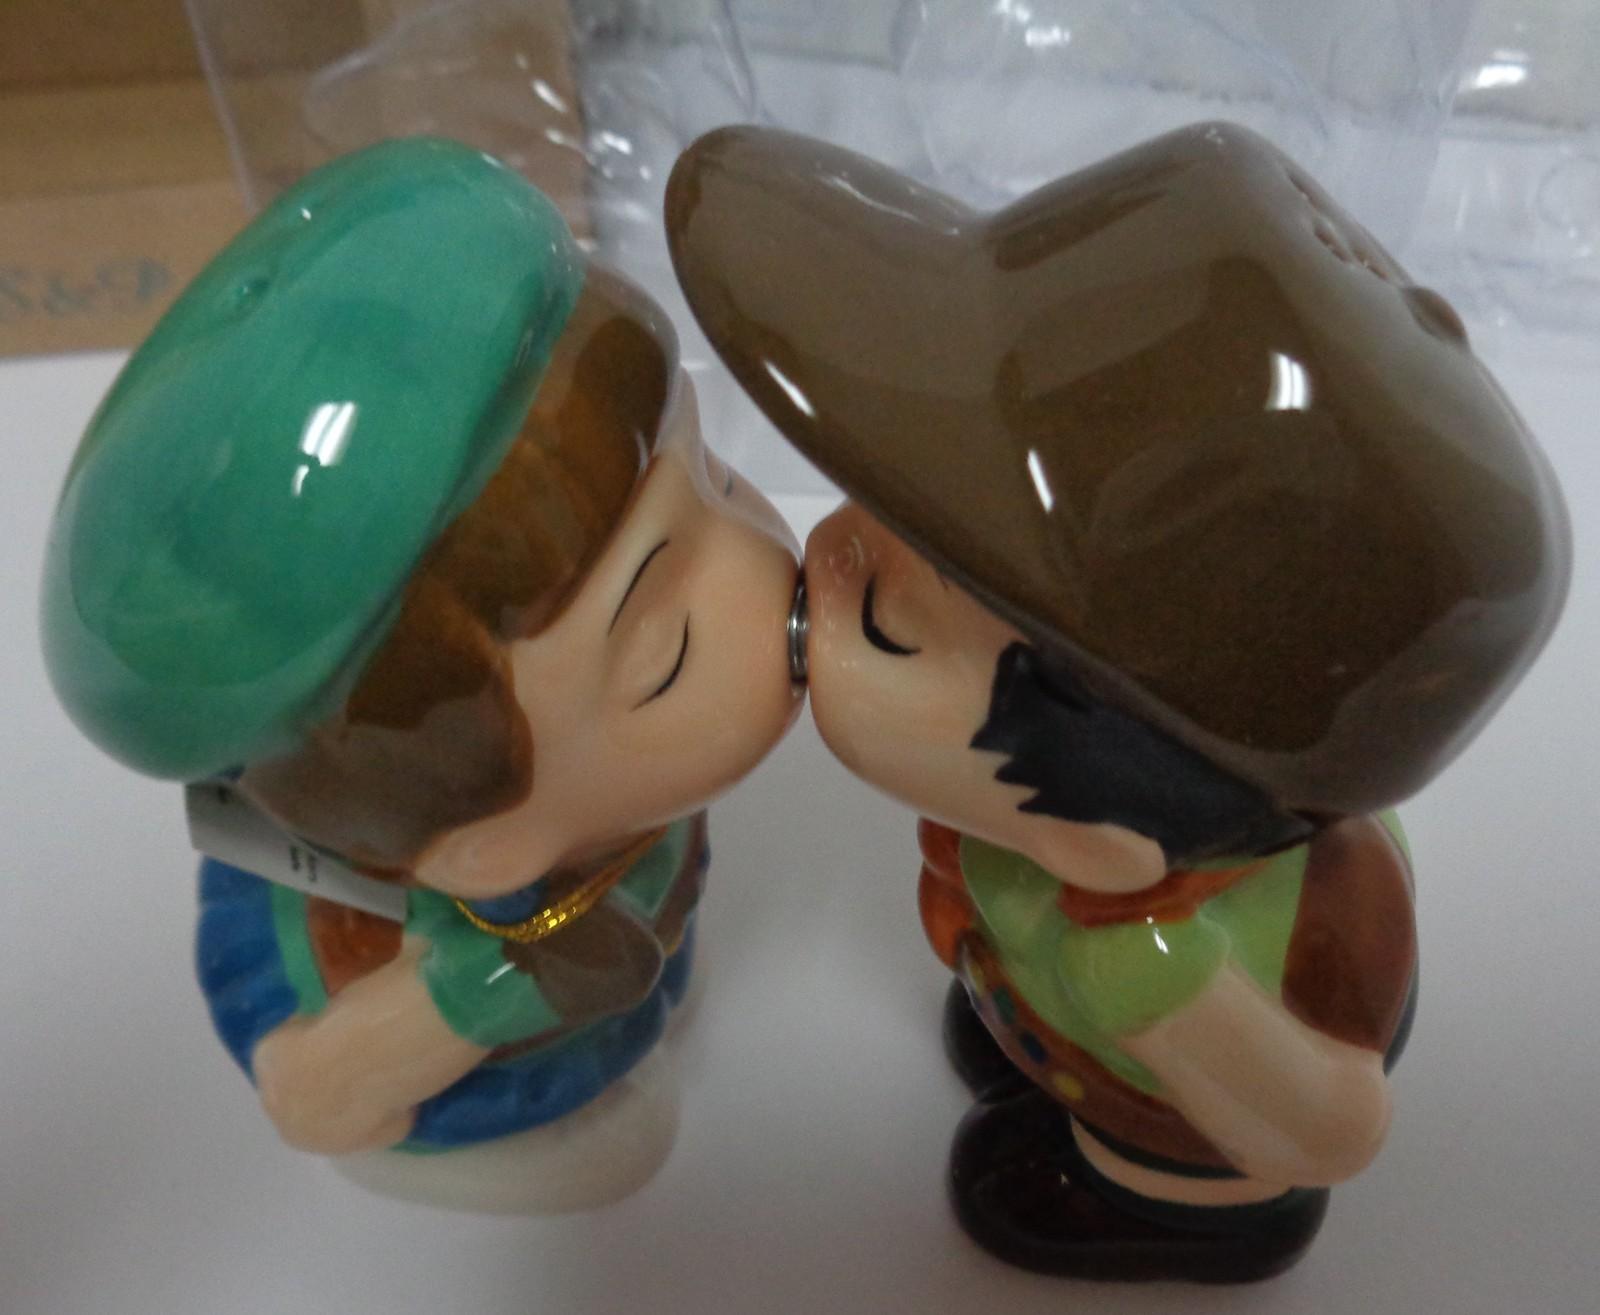 MWAH Magnetic Salt & Pepper Shakers Kissing Couple NIB Free Shipping